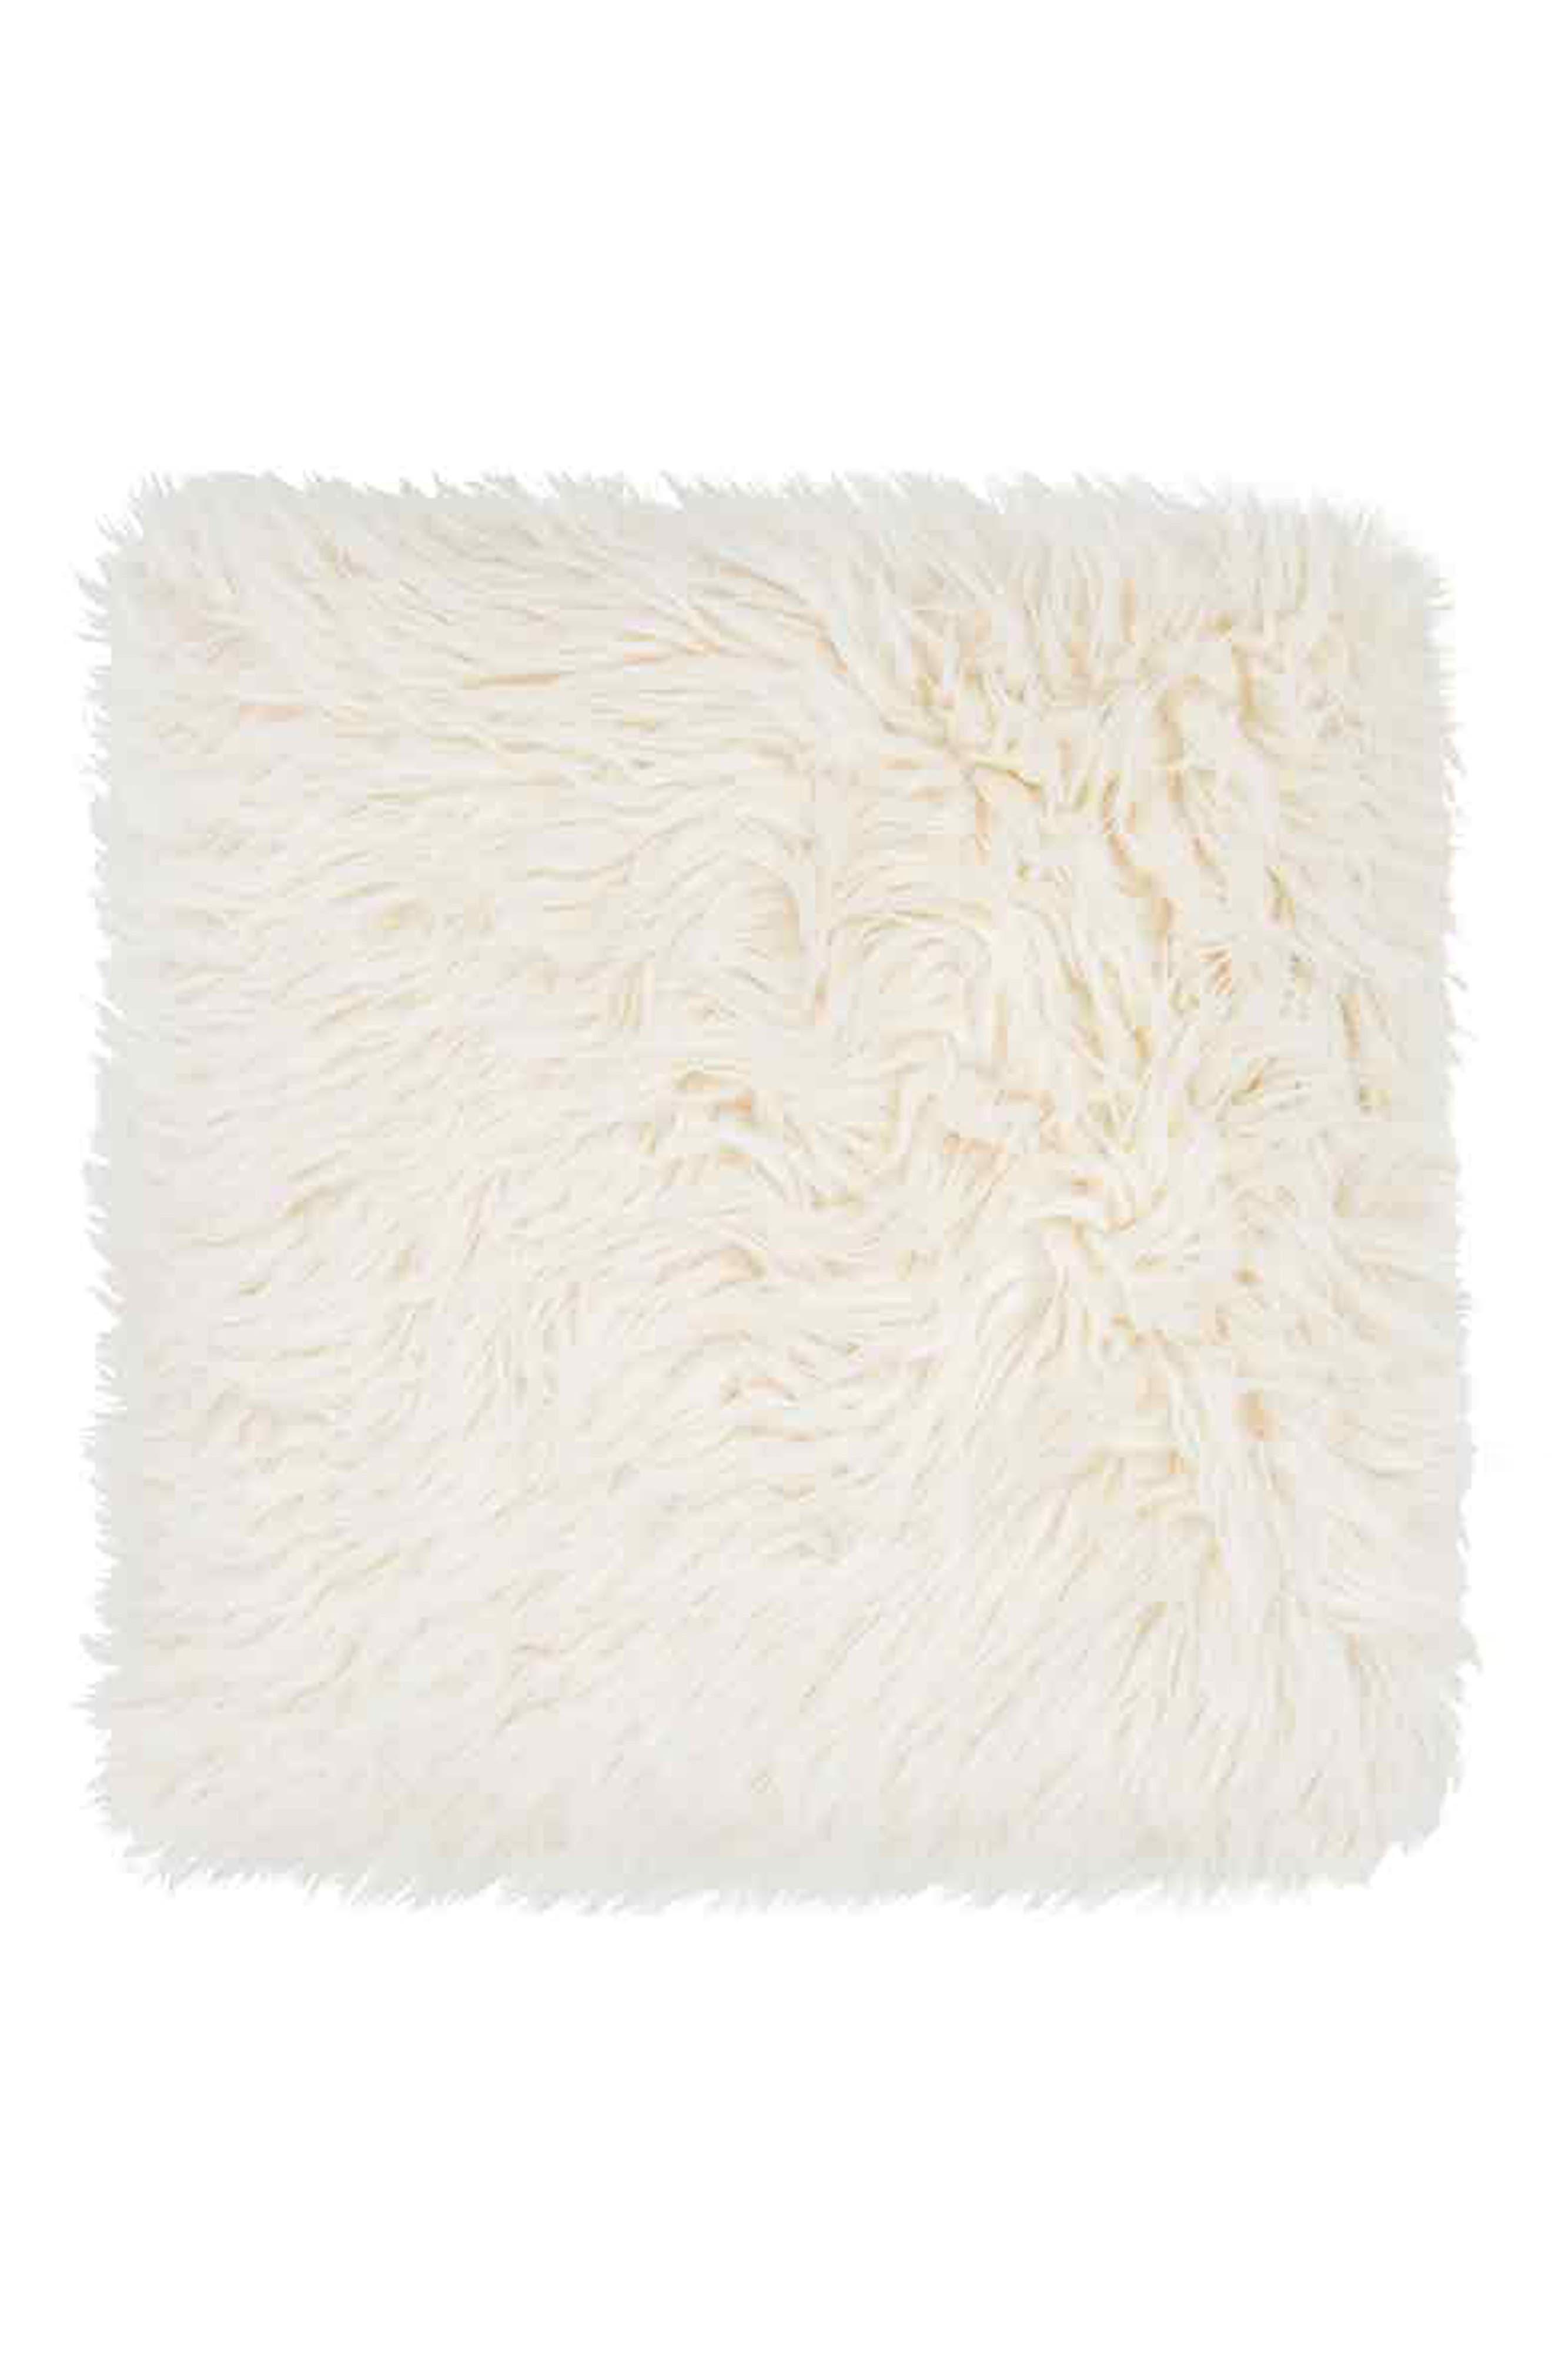 Heron Faux Fur Accent Pillow,                         Main,                         color, WHISPER WHITE/ WHISPER WHITE